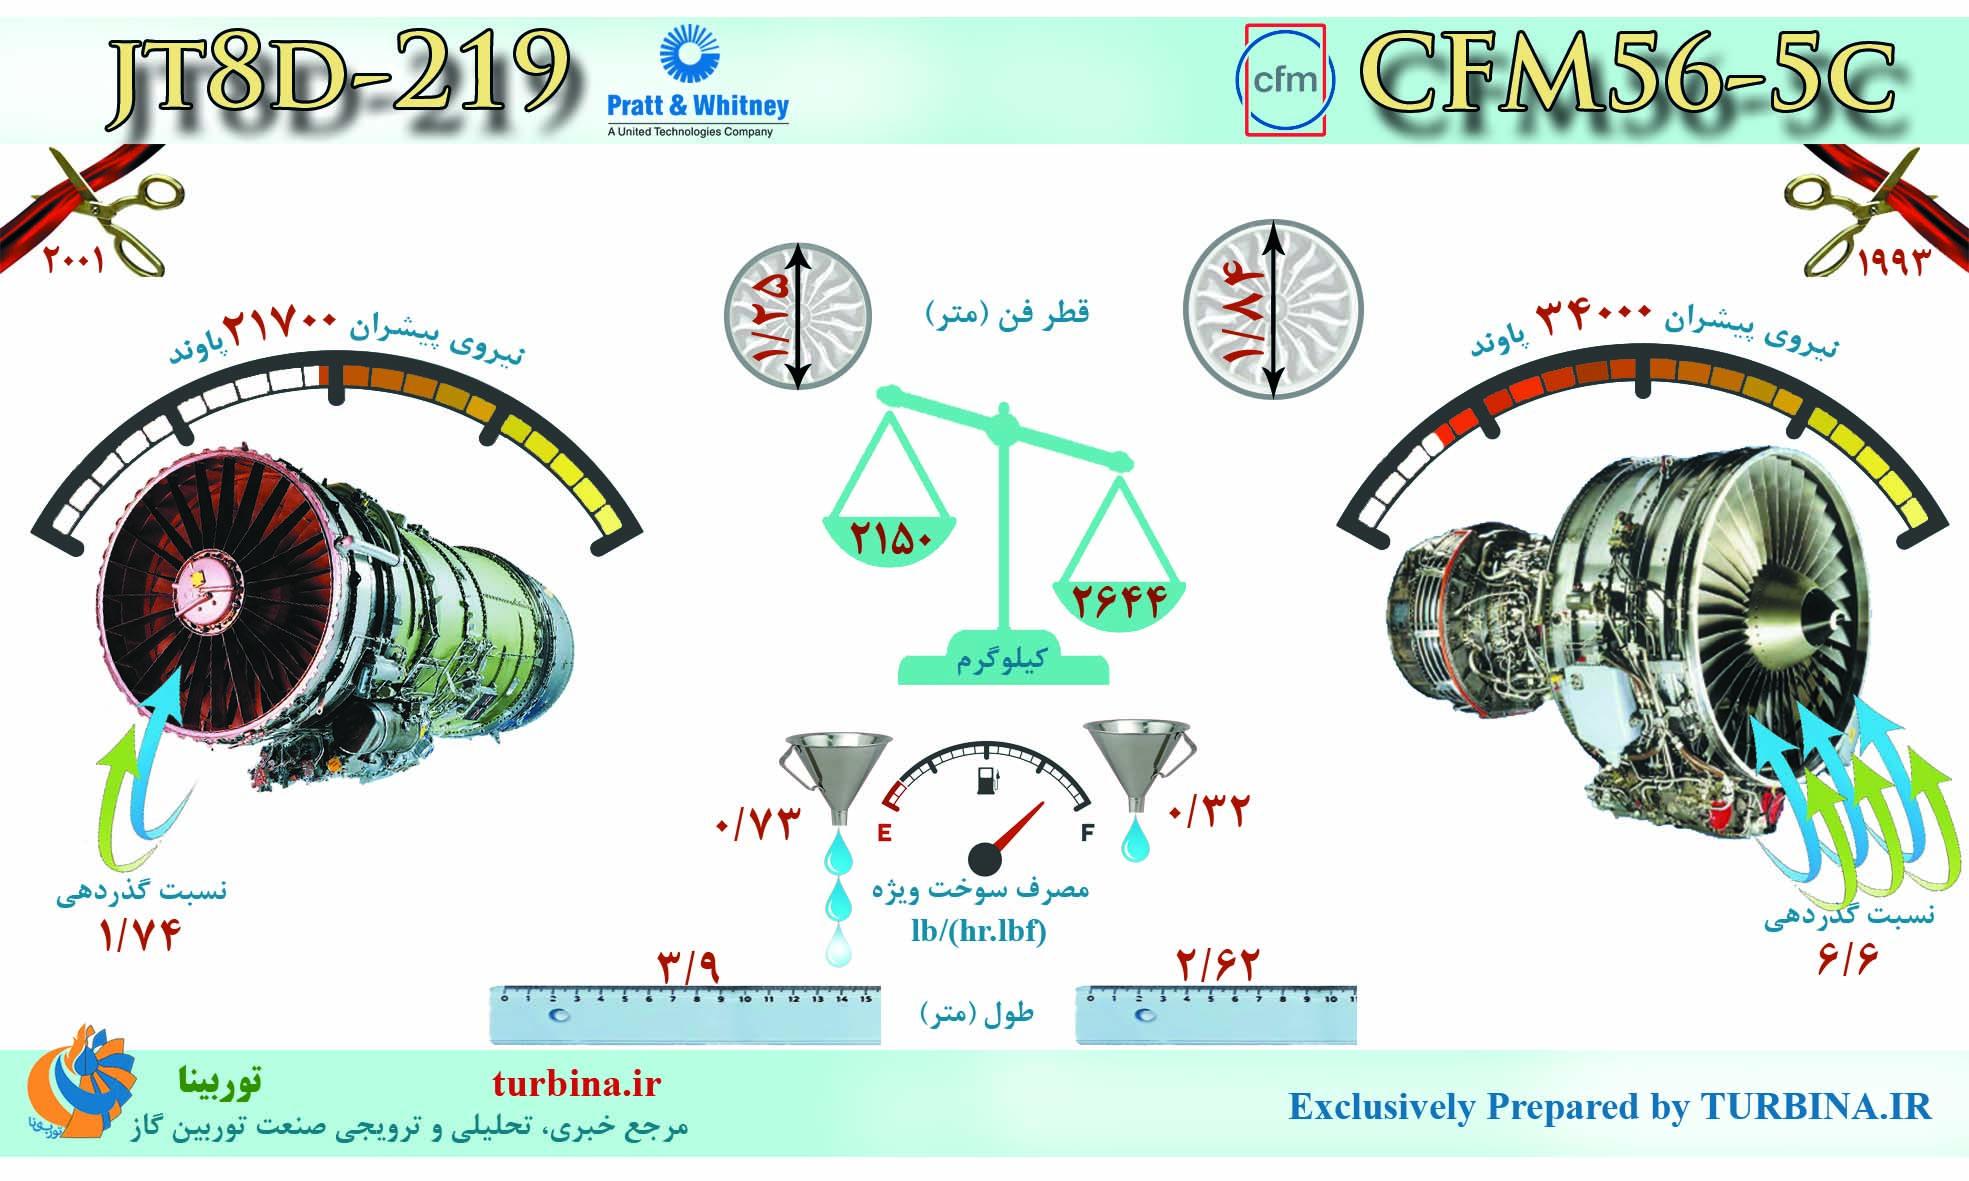 مقایسه موتورهای JT8D-219 و CFM56-5C